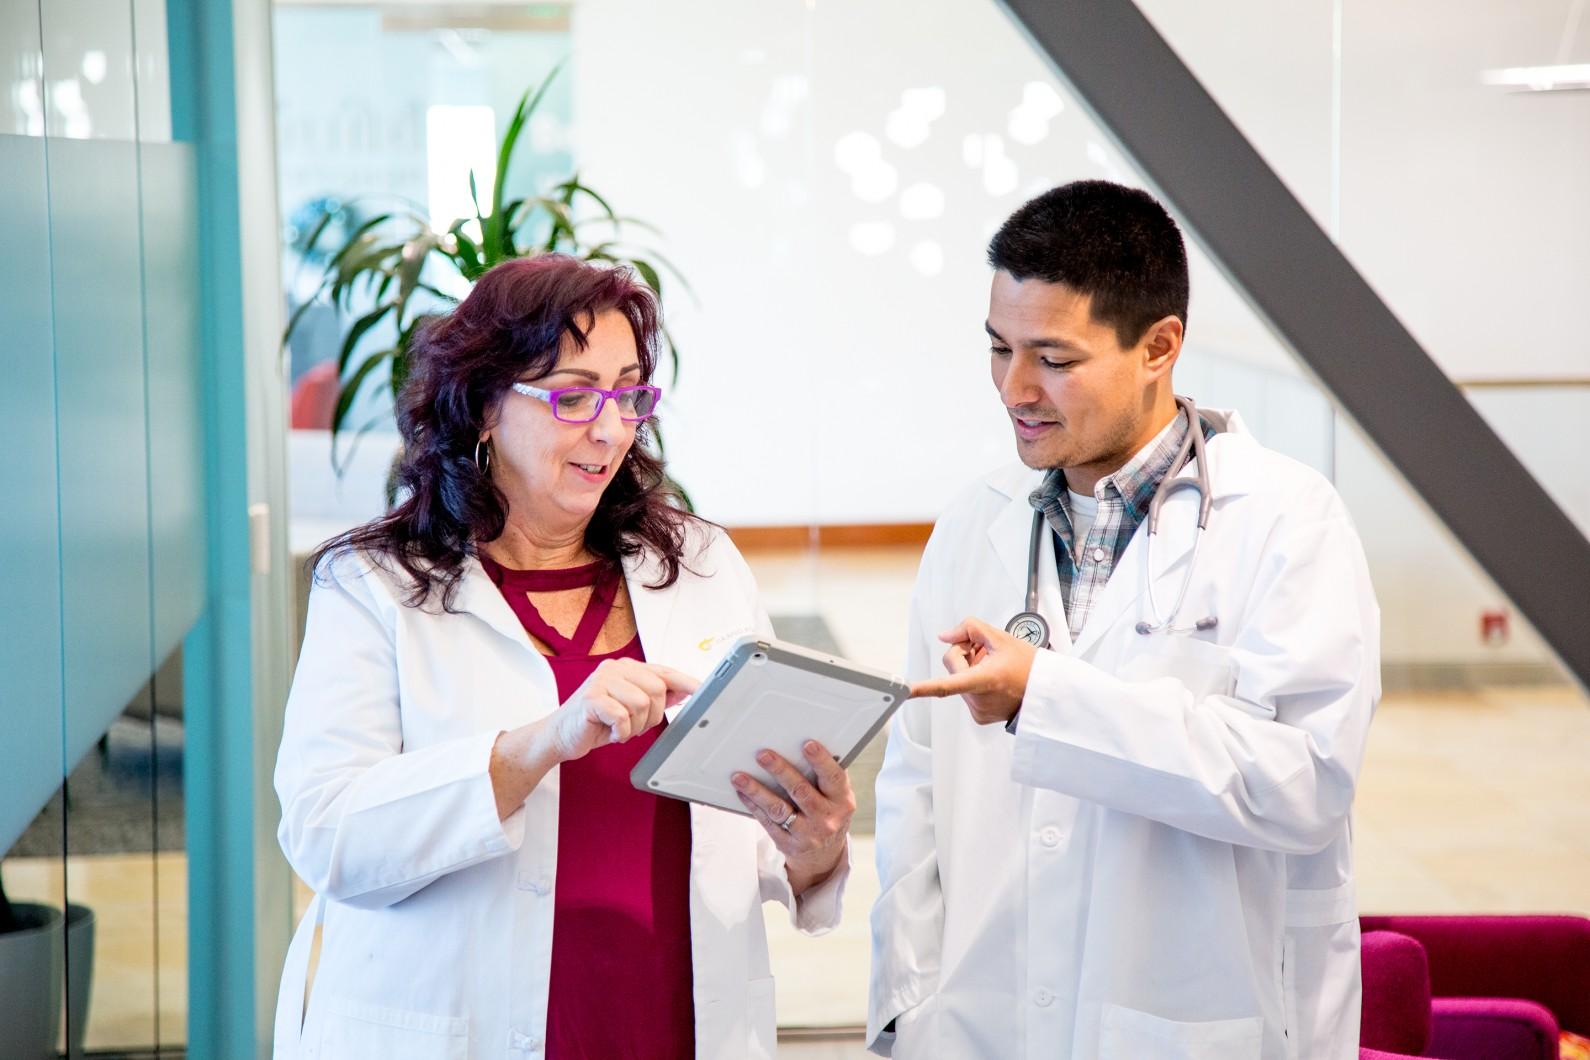 2 doctors discussing